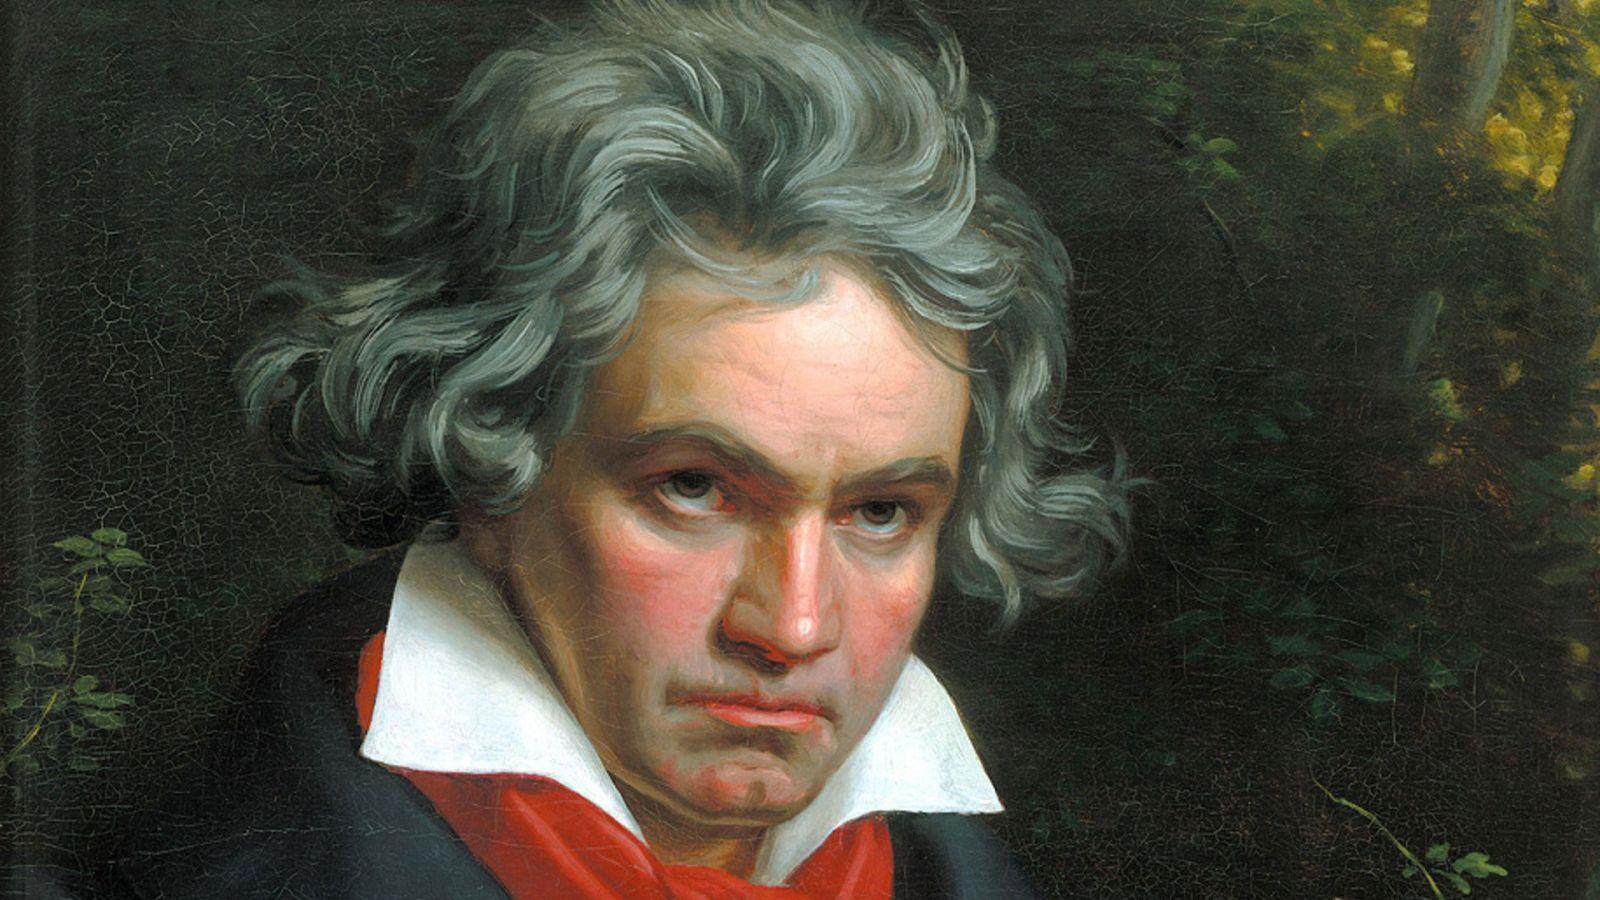 Приключения Людвига ван Бетховена: Google посвятил дудл немецкому композитору - фото №4